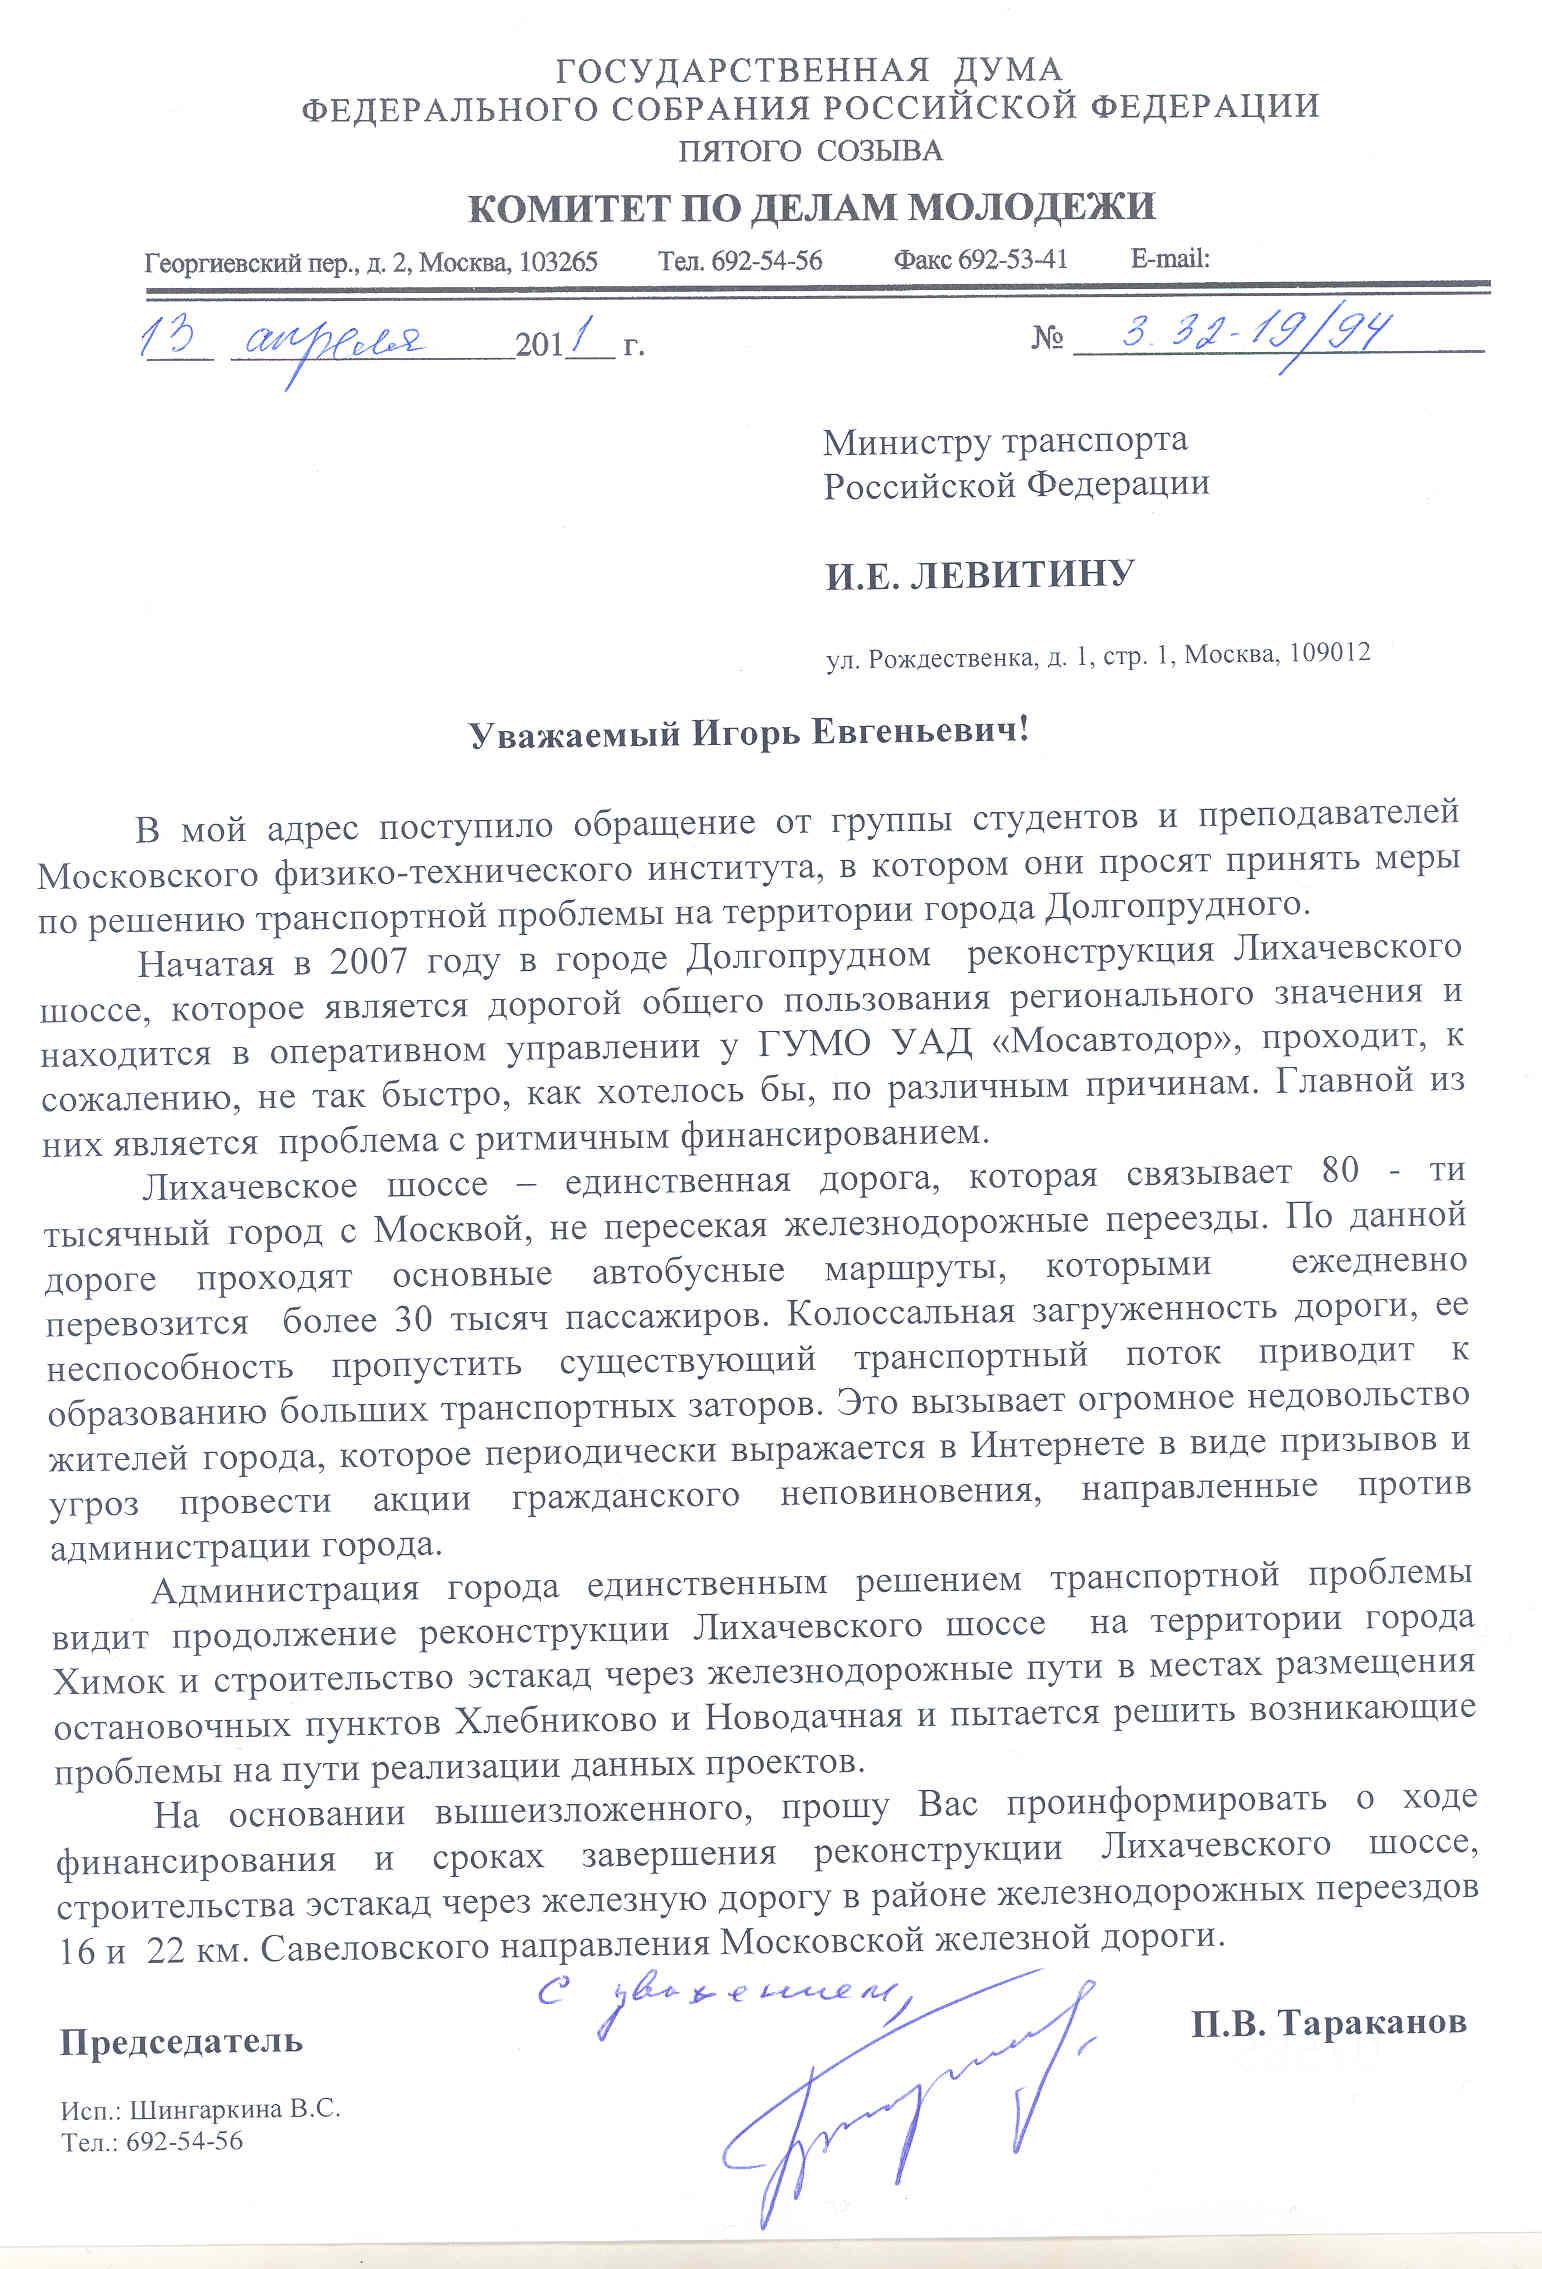 http://forum.darnet.ru/misc.php?item=735&download=1